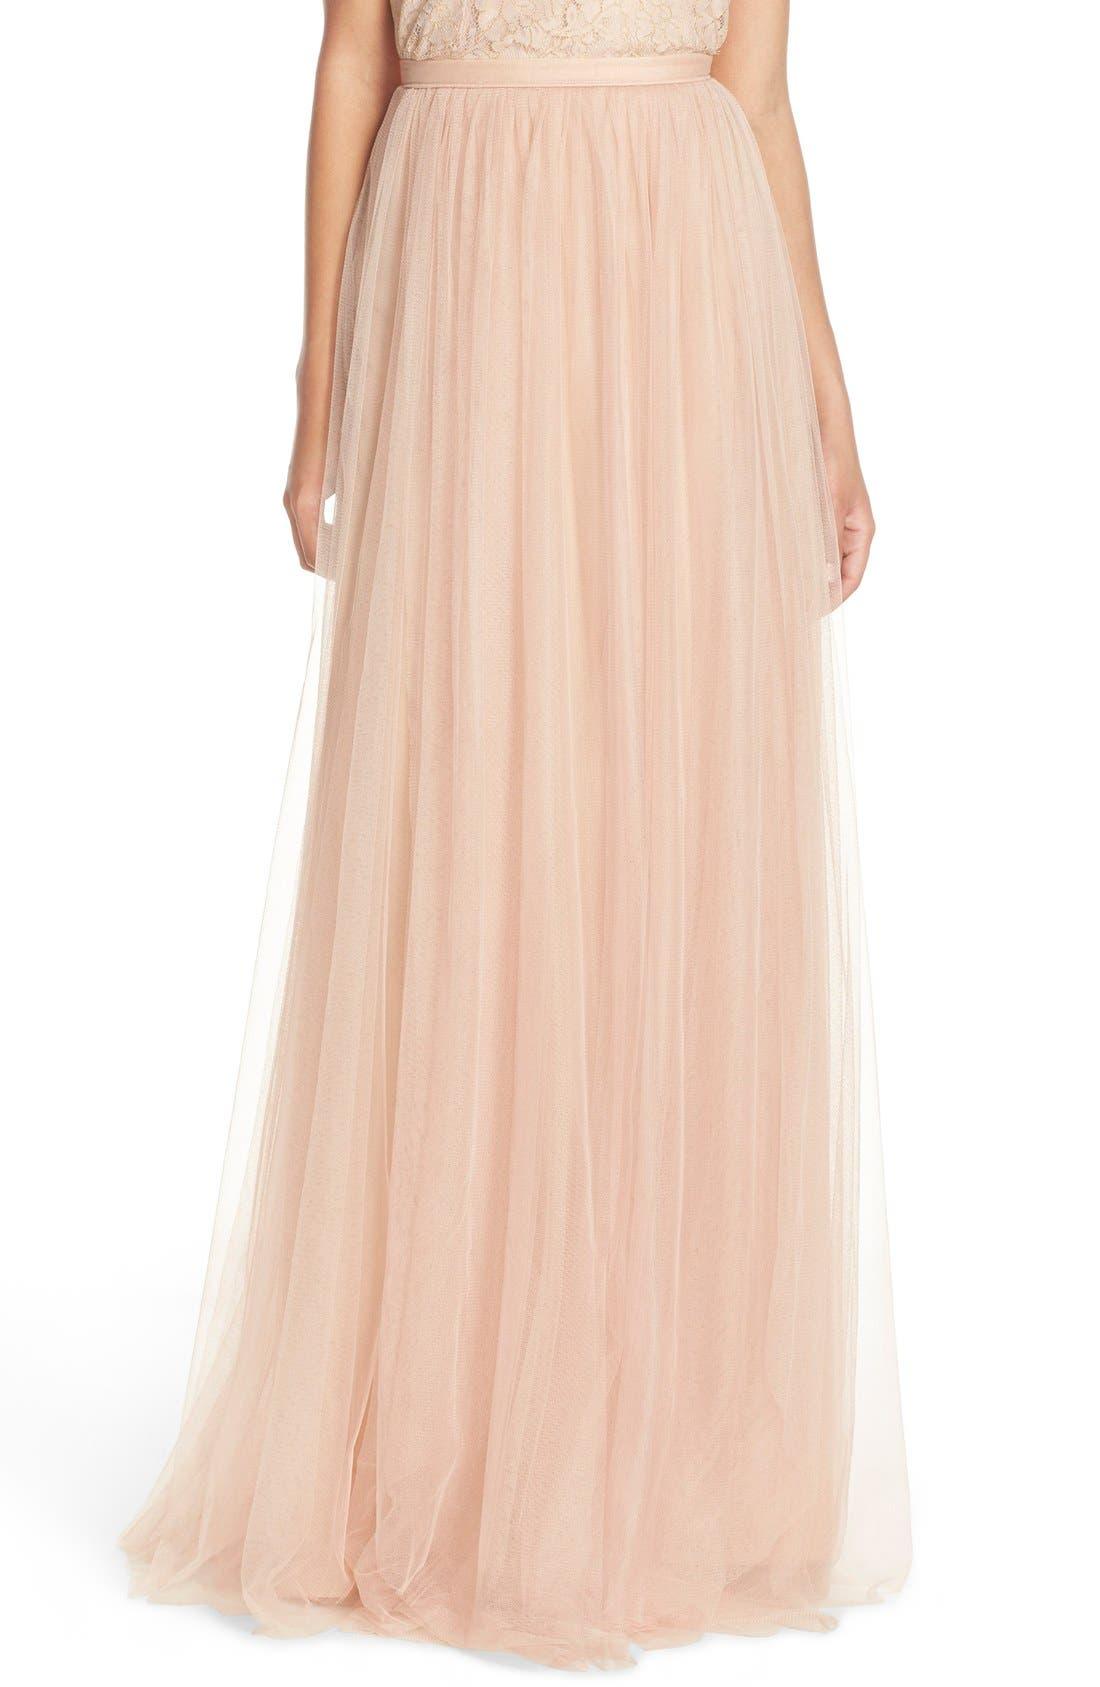 Arabella Tulle Ballgown Skirt, Main, color, 685